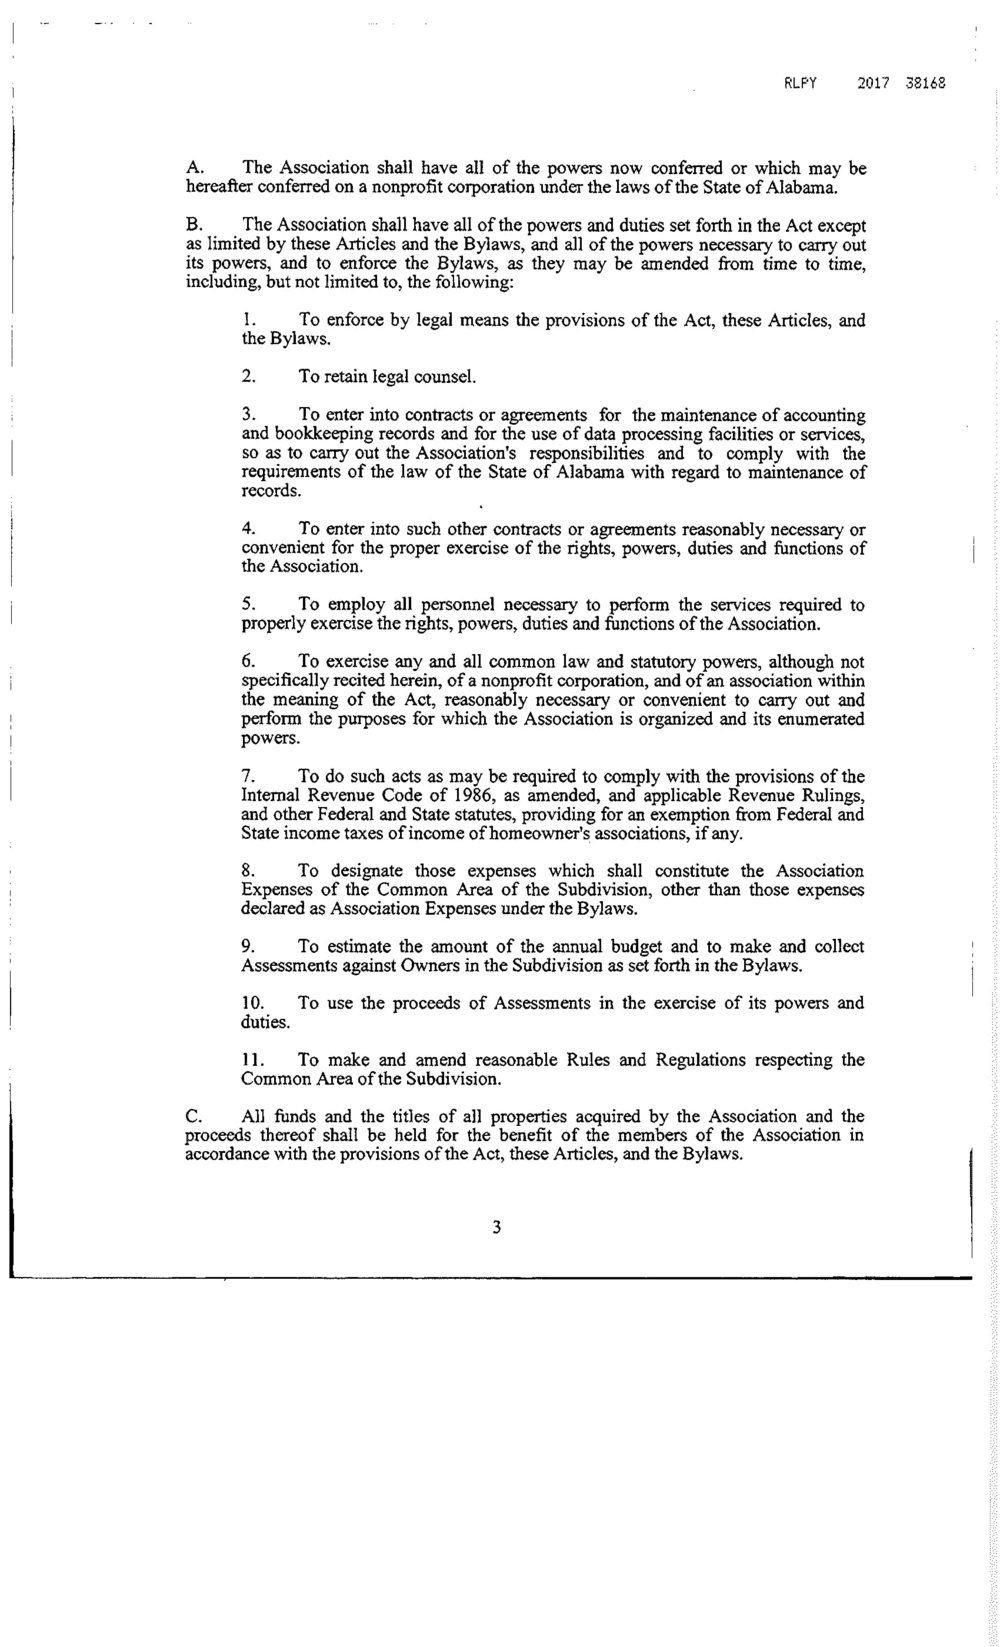 Covenants-Pine-Ridge-Subdivision-1-59.jpg